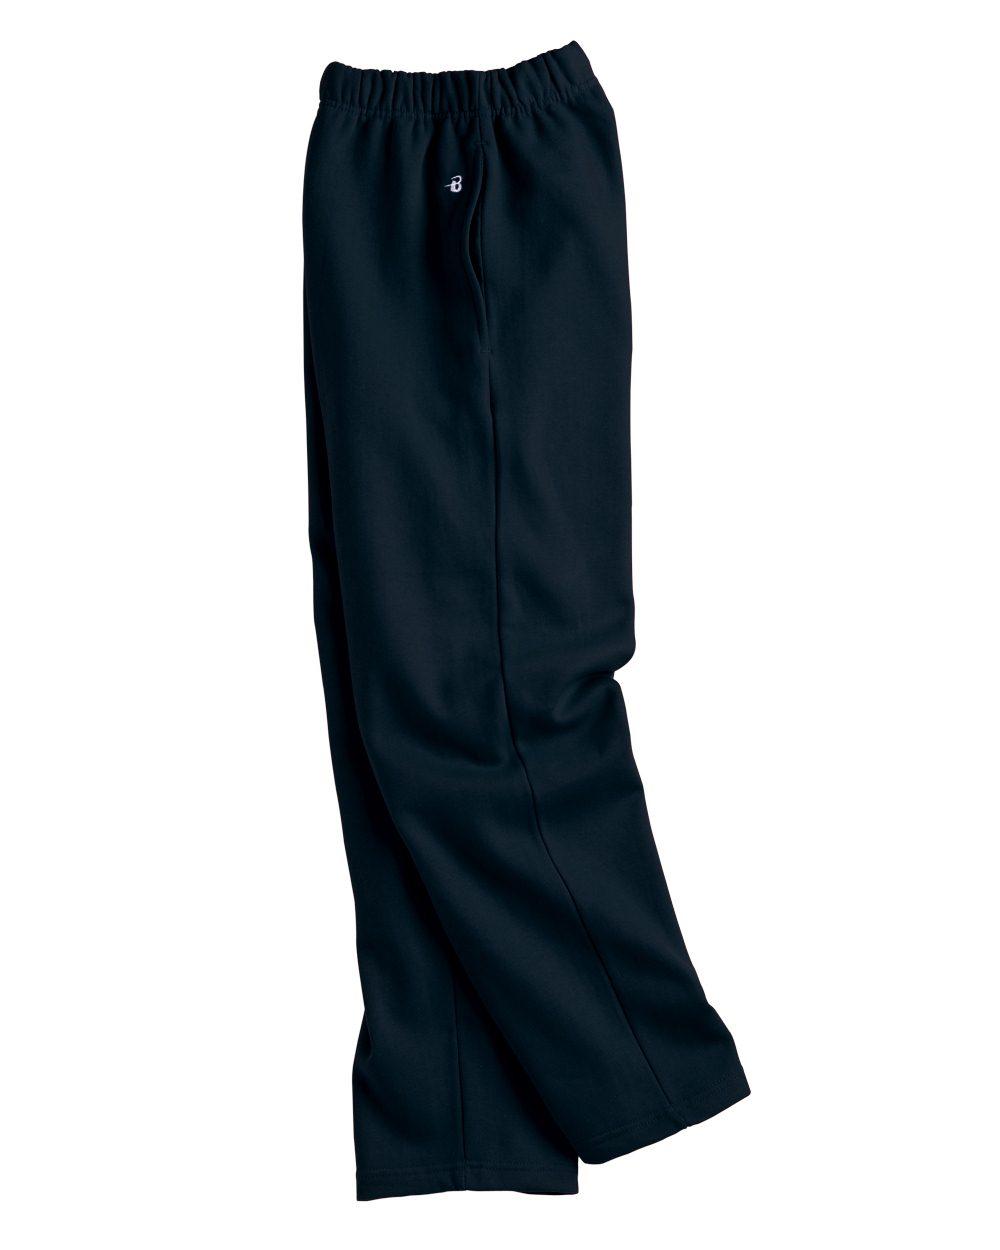 Badger Sport 1277 Open Bottom Sweatpants